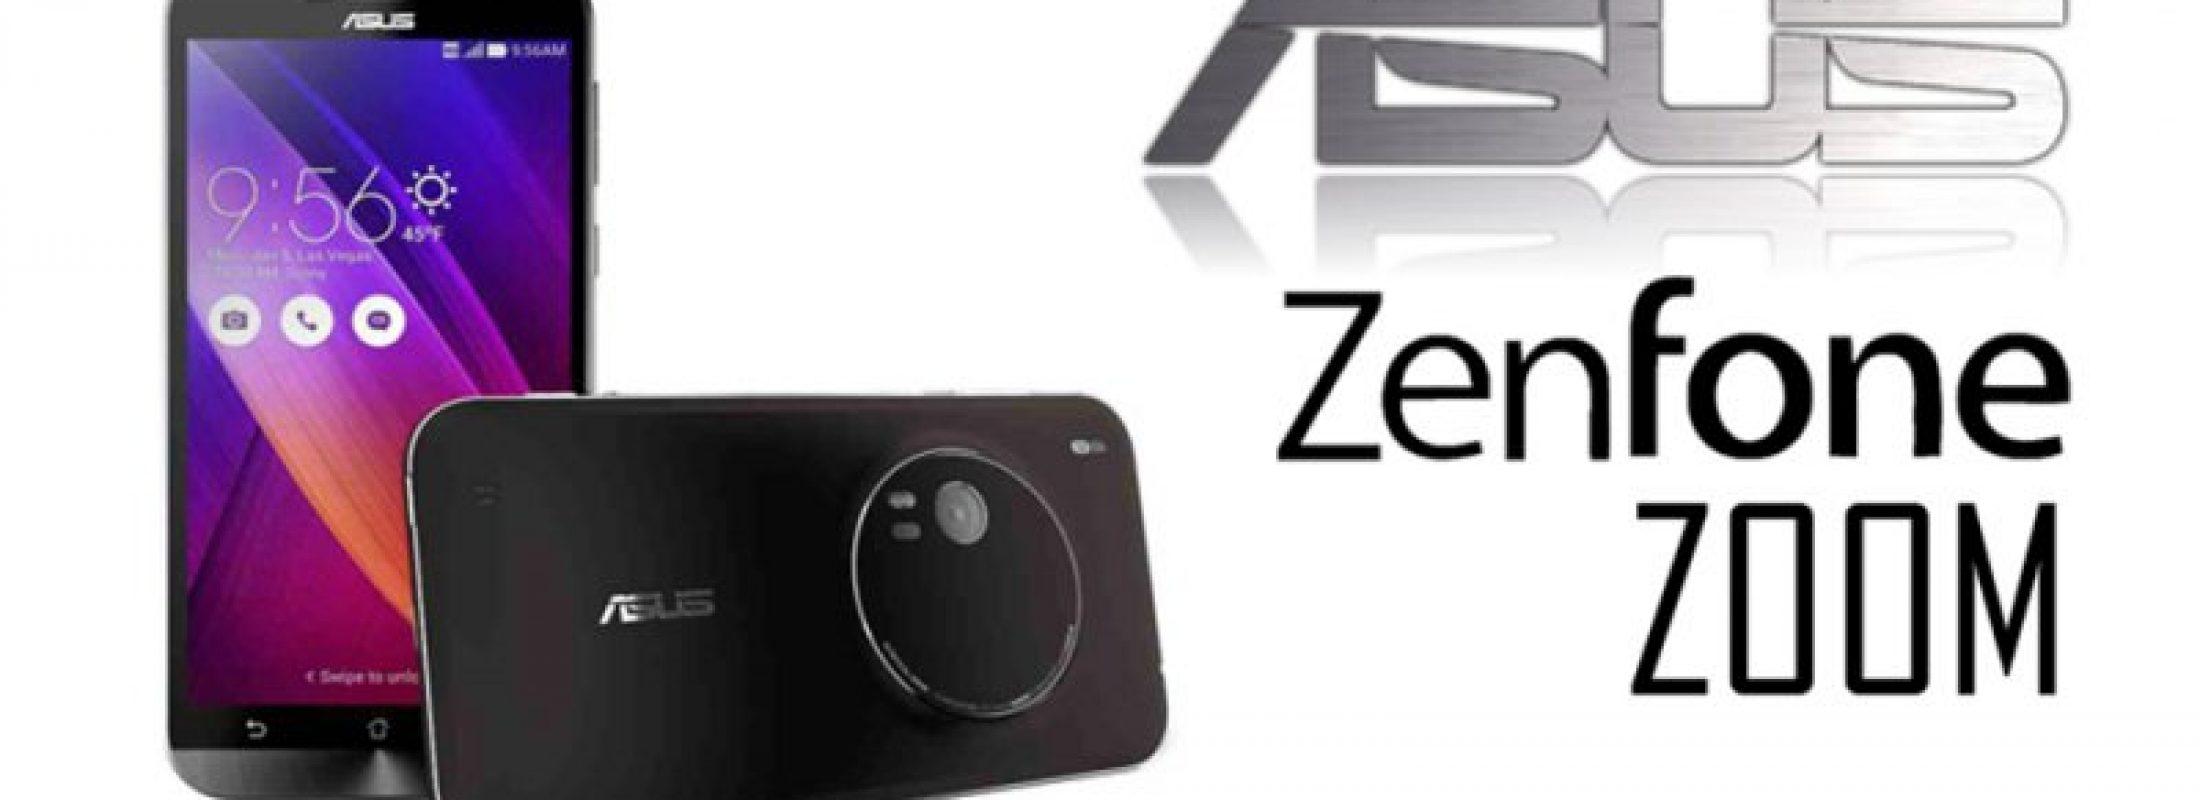 Asus'tan çift kameralı Zenfone 3 Zoom!